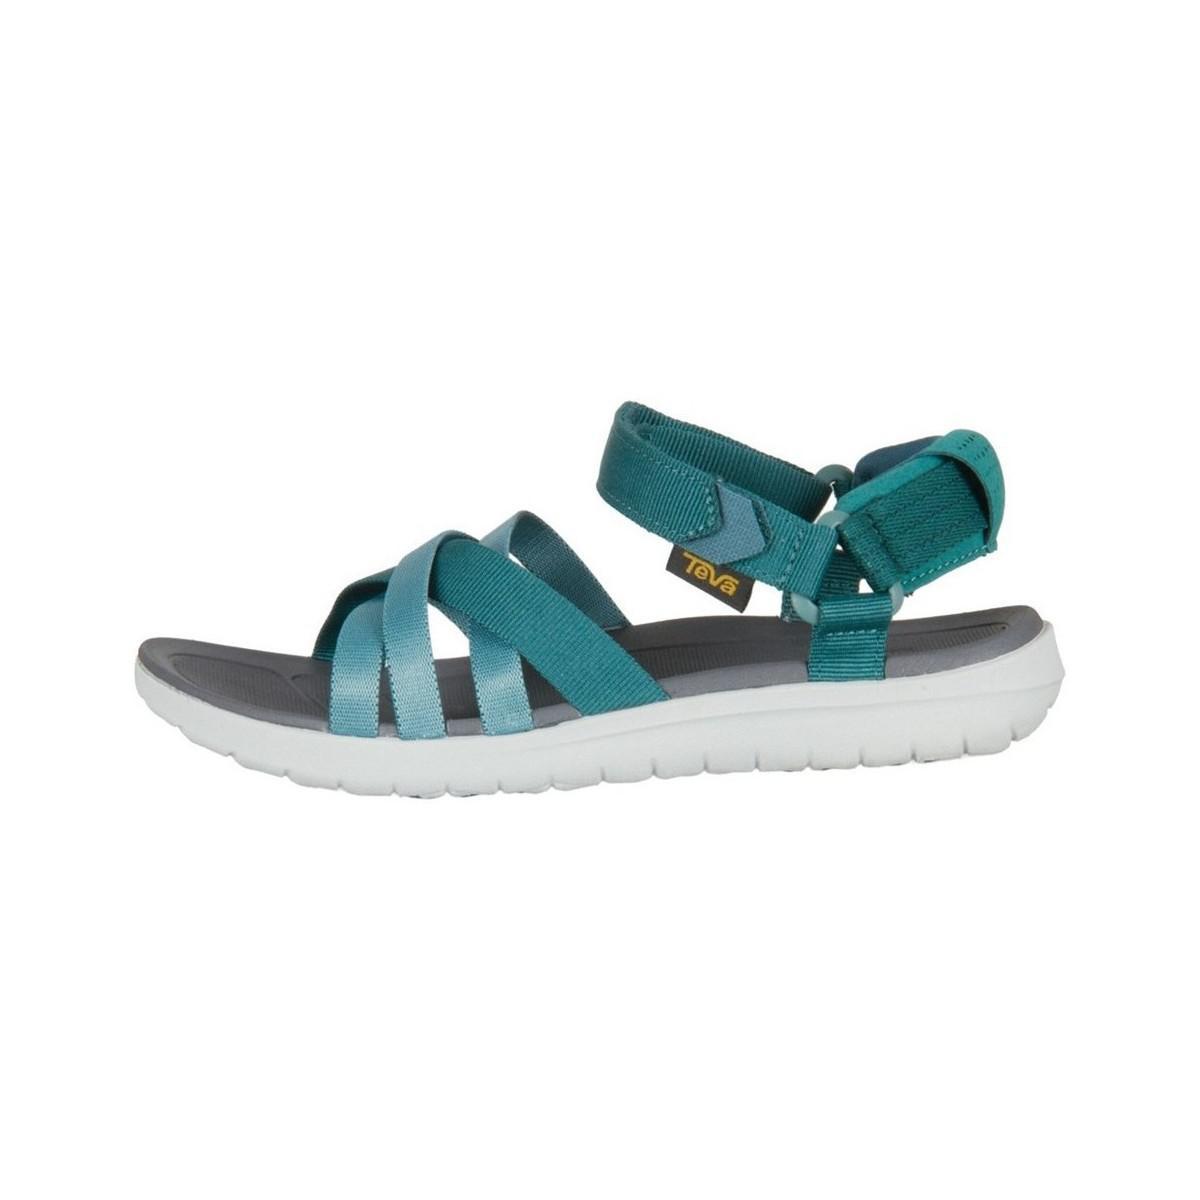 94293c52b Teva Sanborn Sandal Women s Sandals In Multicolour - Lyst